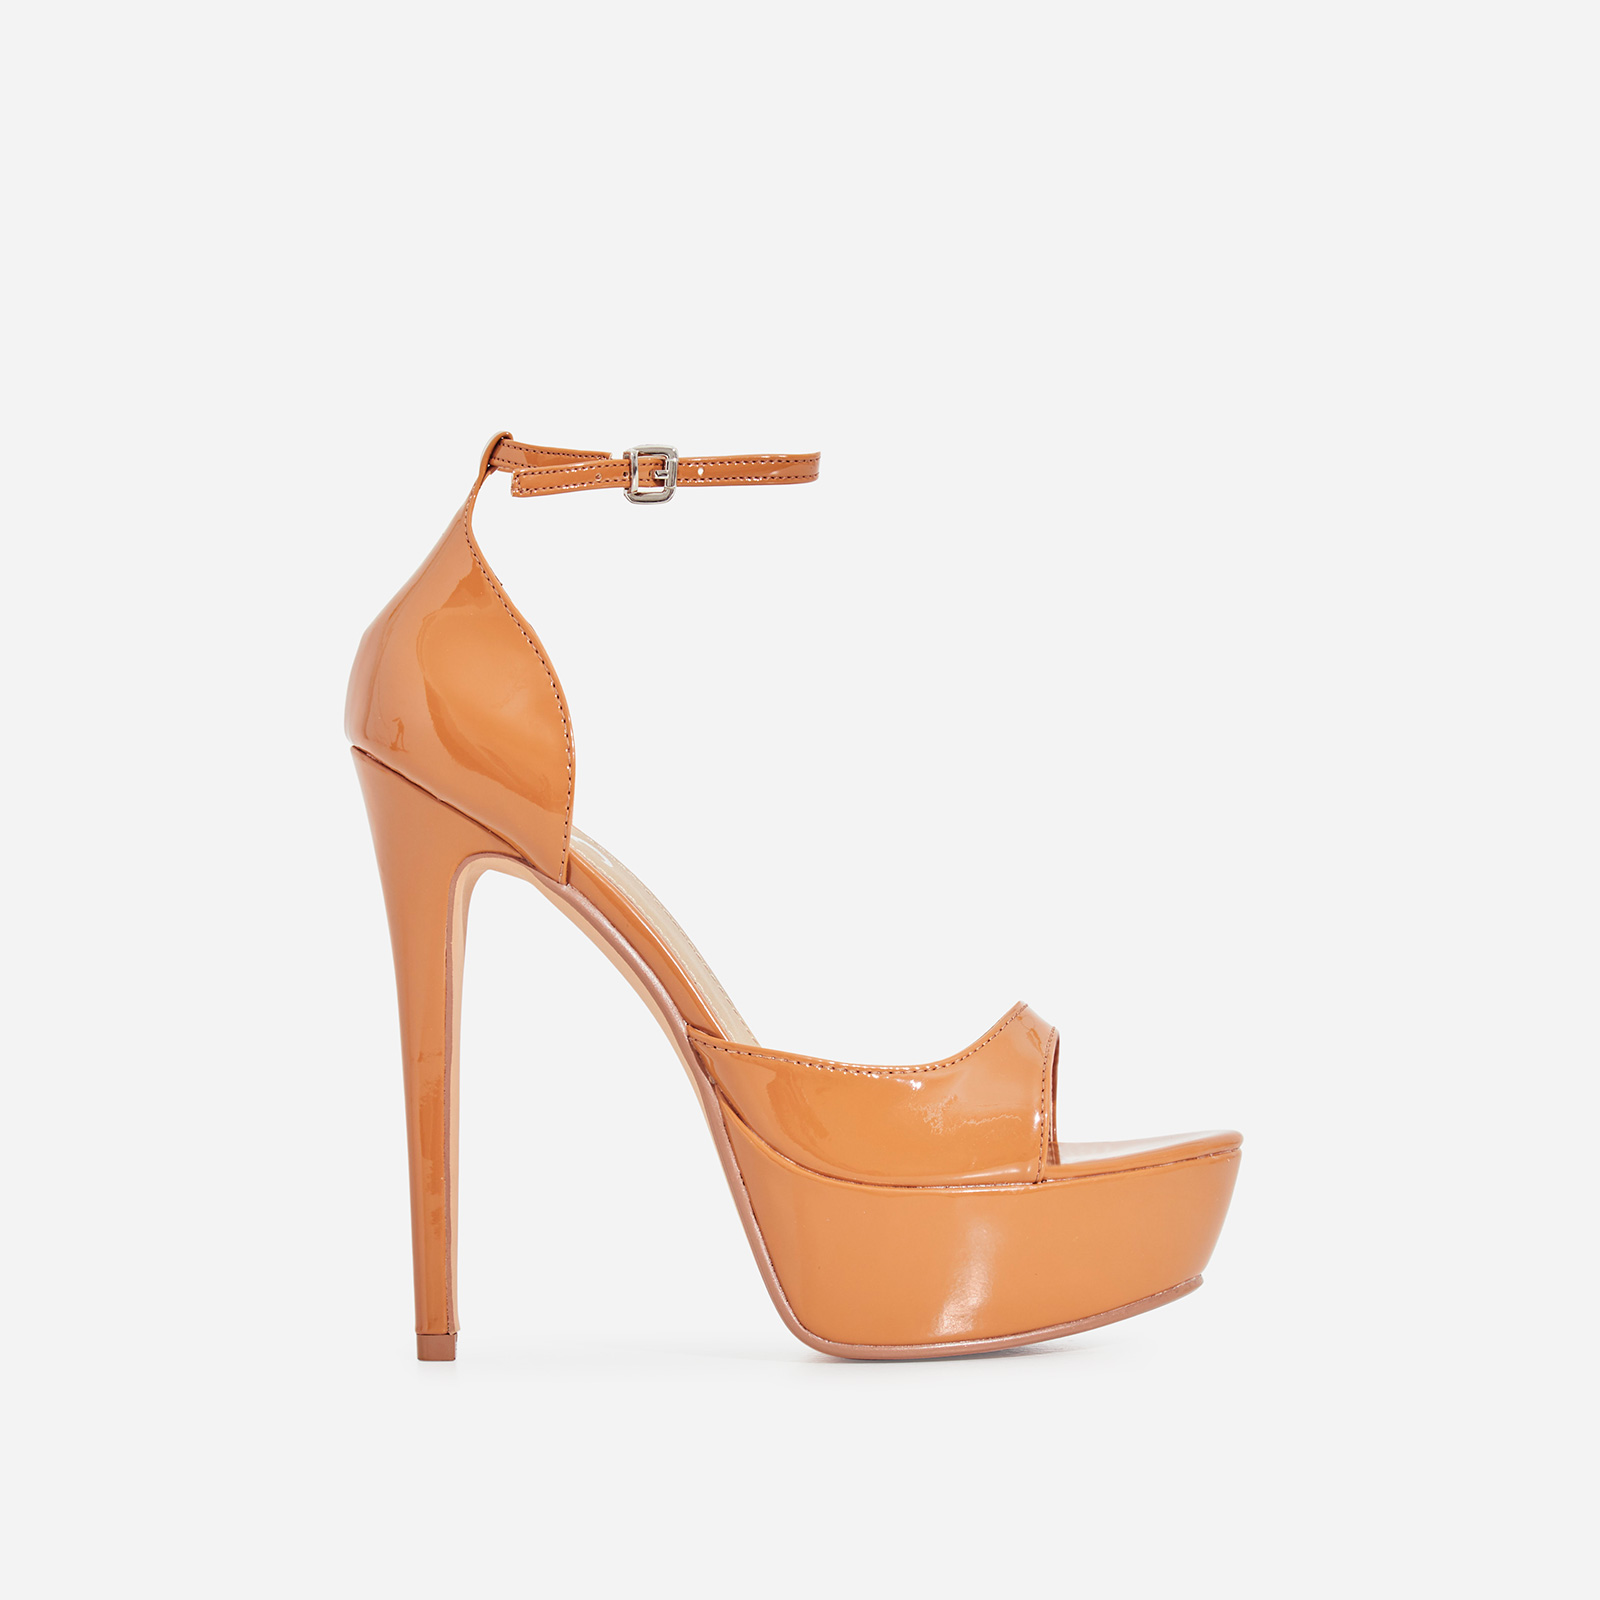 Catwalk Peep Toe Platform Heel In Mocha Patent